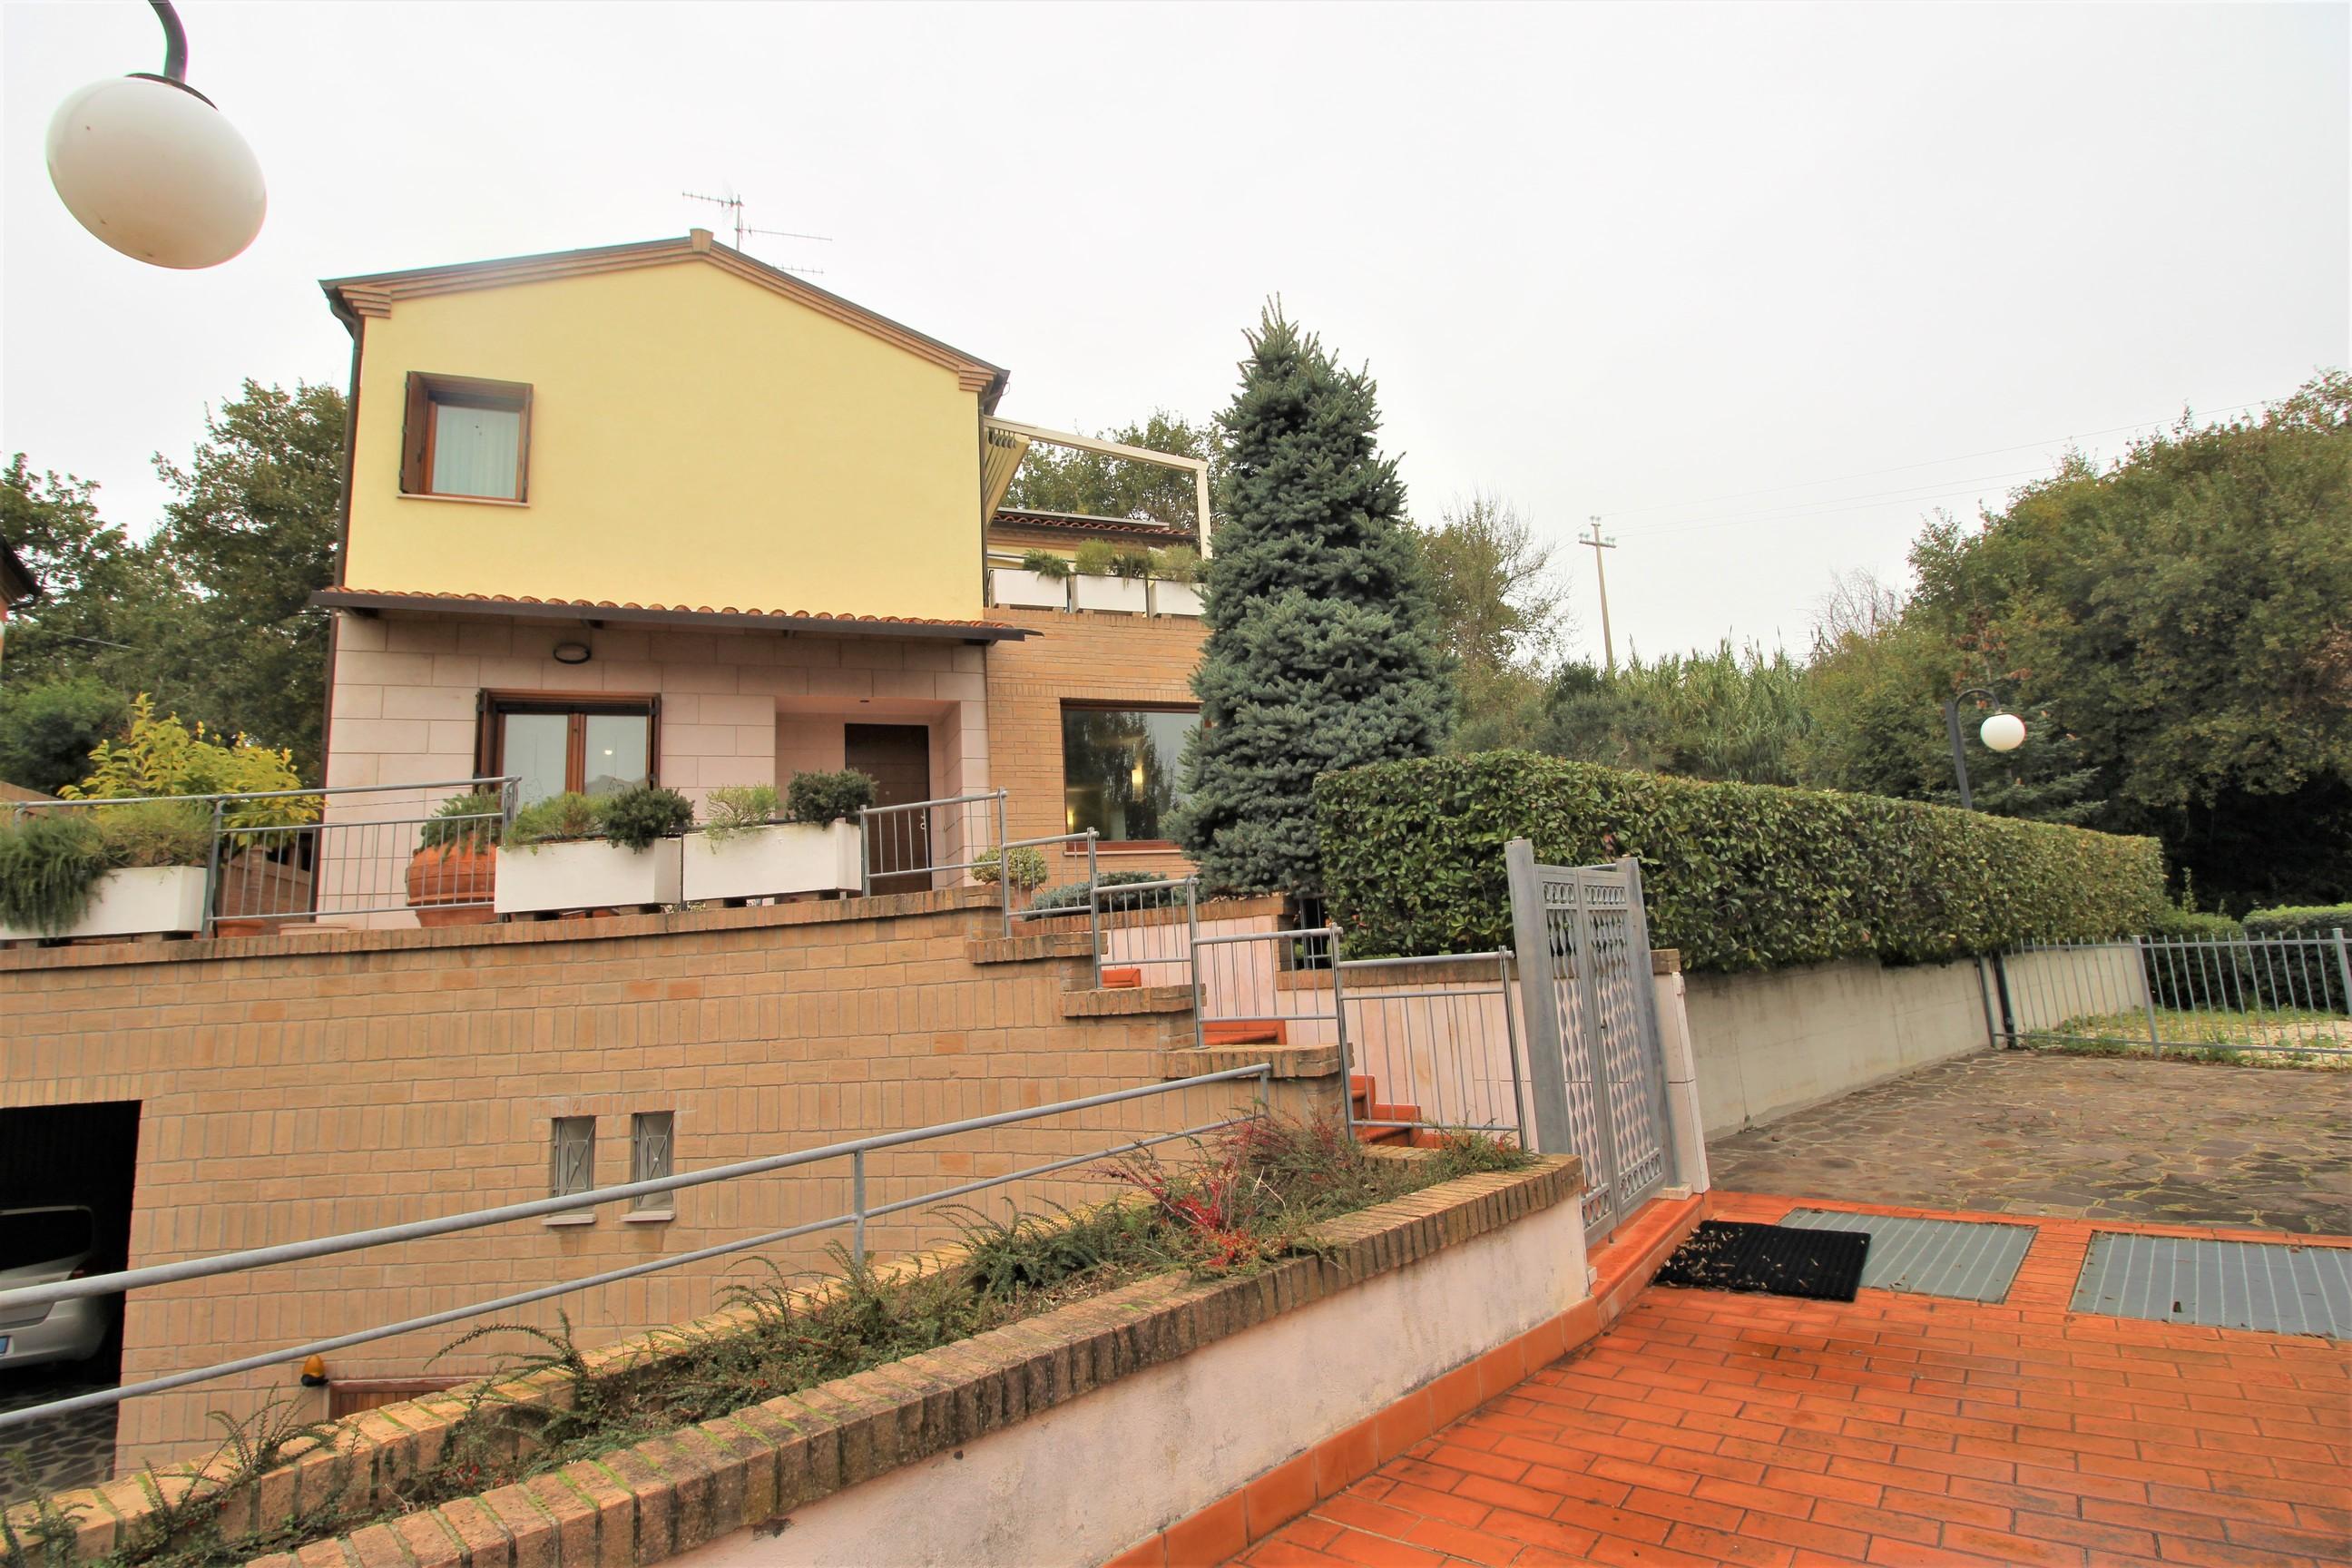 Al Giardino Ancona casa singola con giardino e taverna ad ancona, piccolo